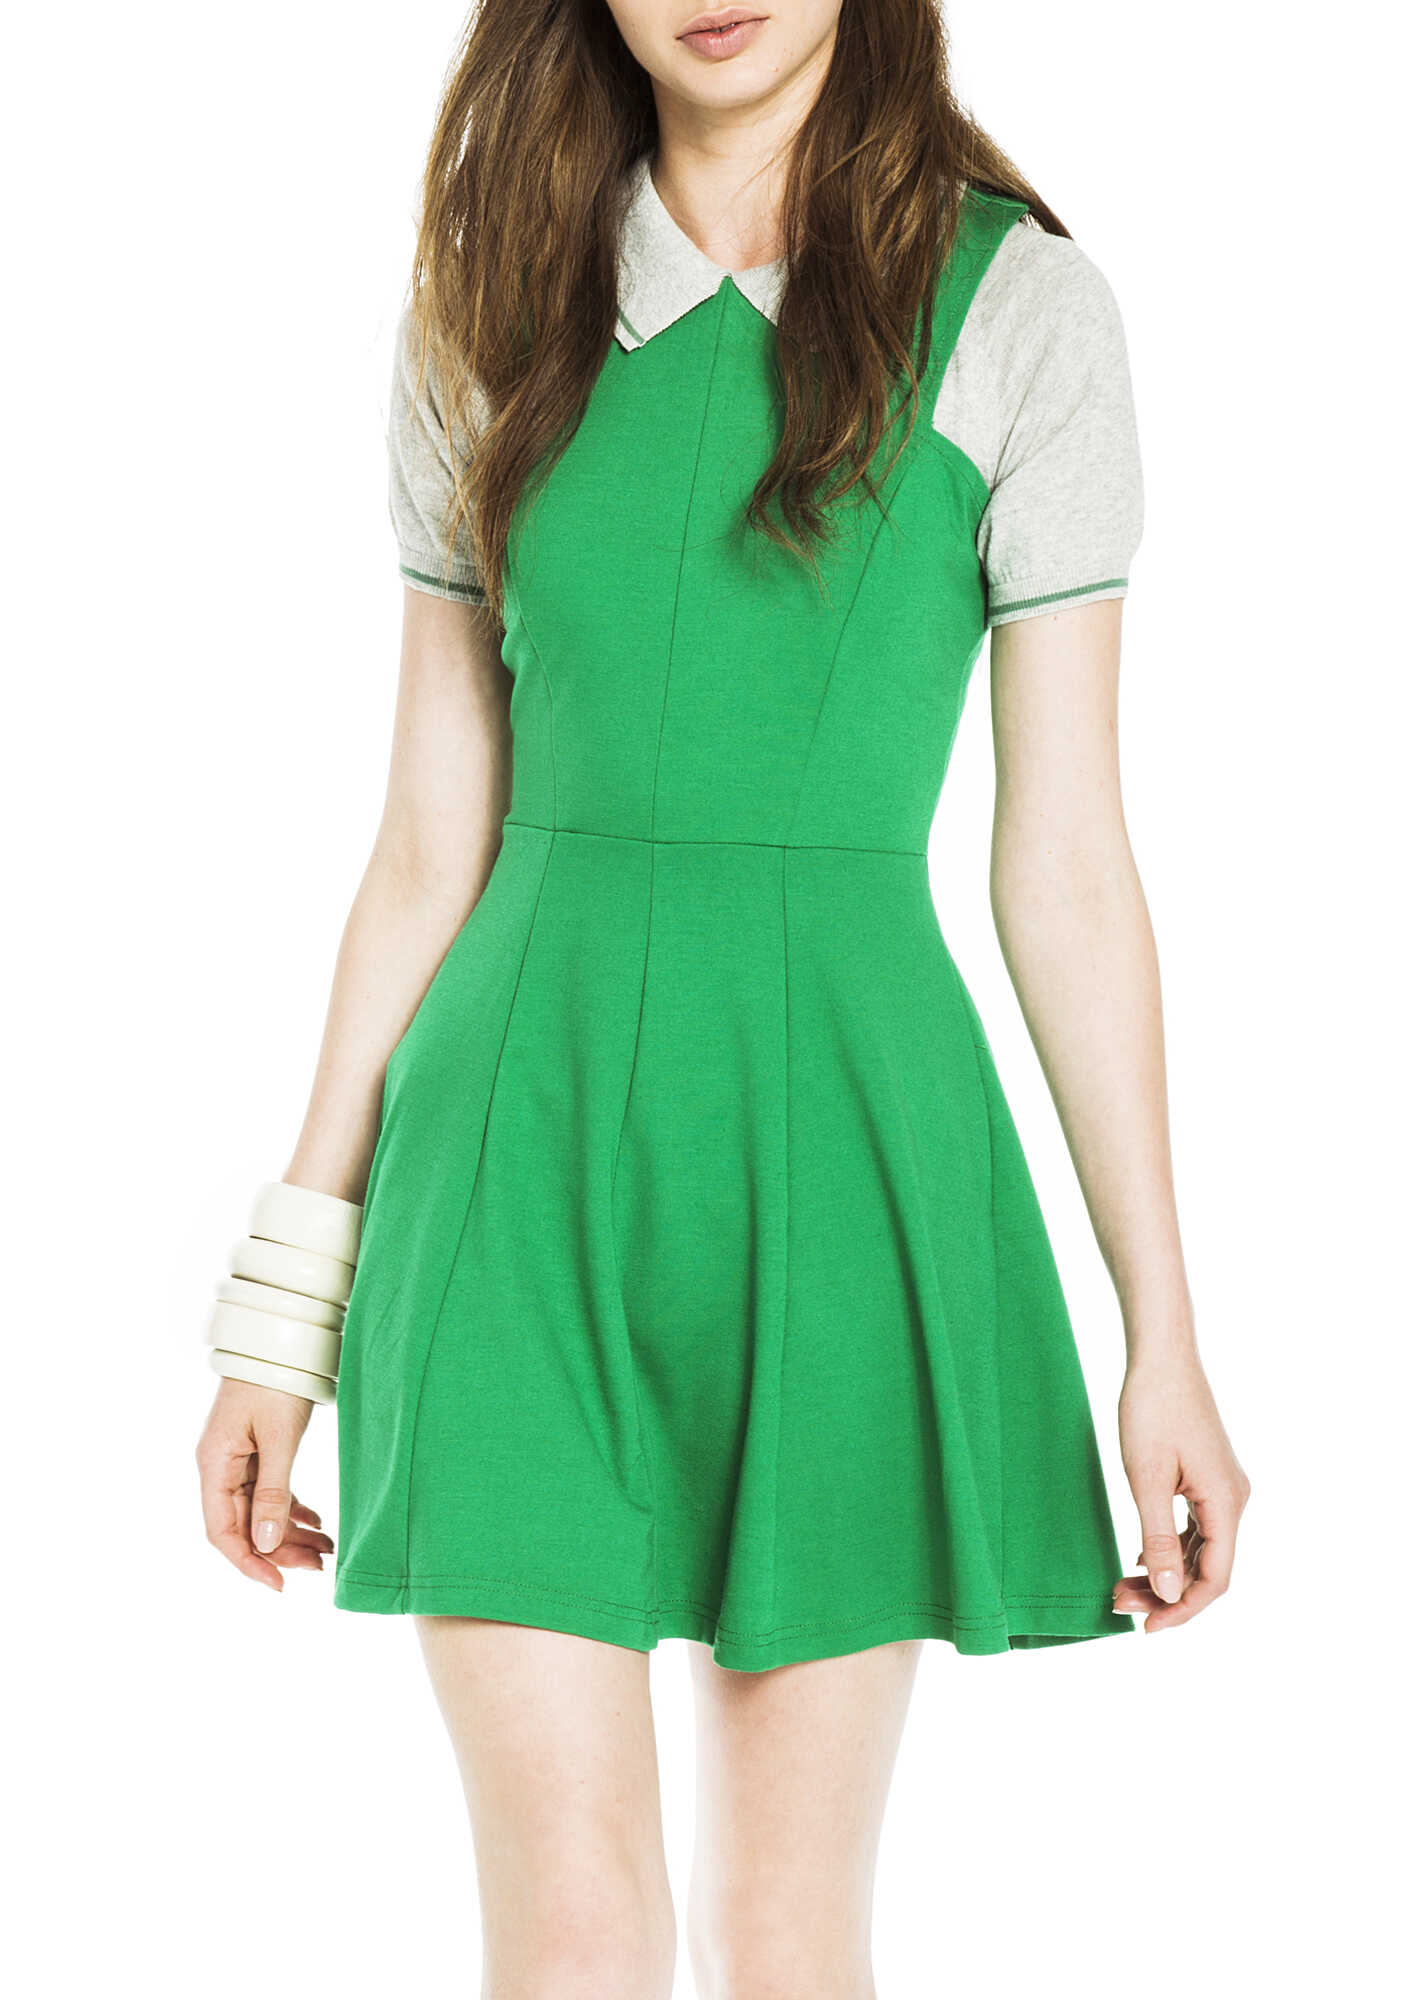 Kling Lindsay Green Sleeveless Dress* GREEN